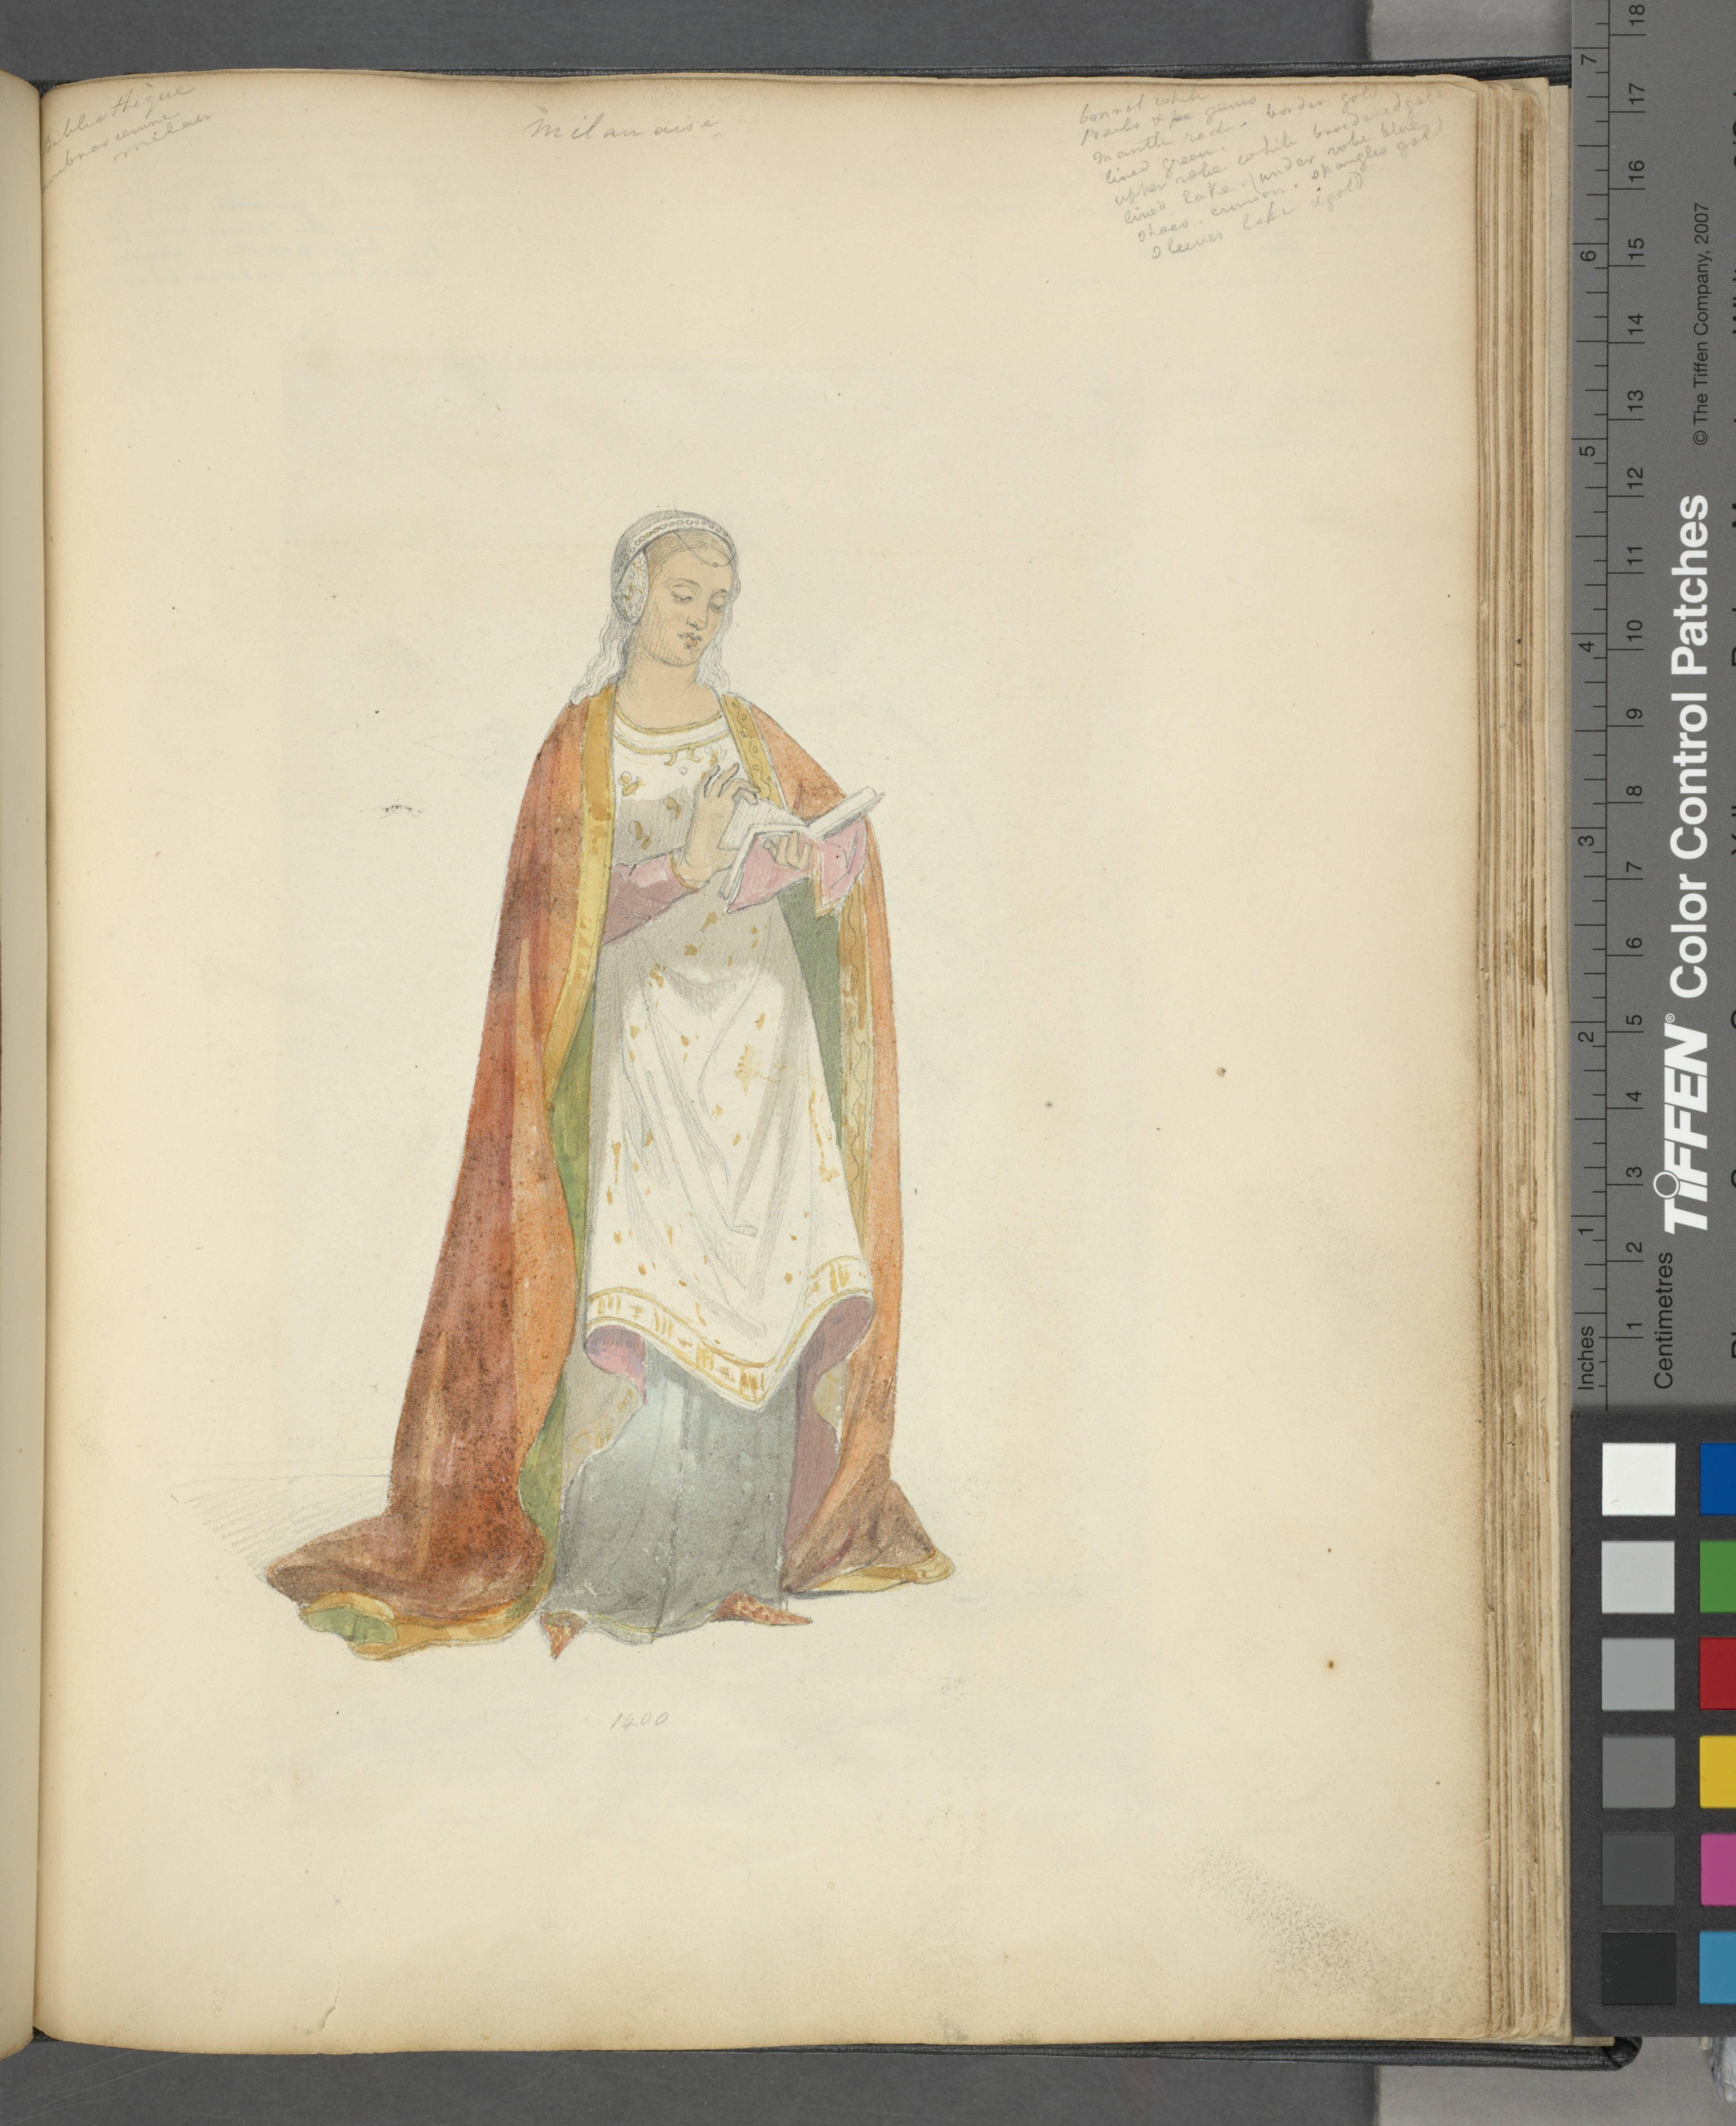 [Woman reading a book,] Milanaise, 1400 - Stewart Watson